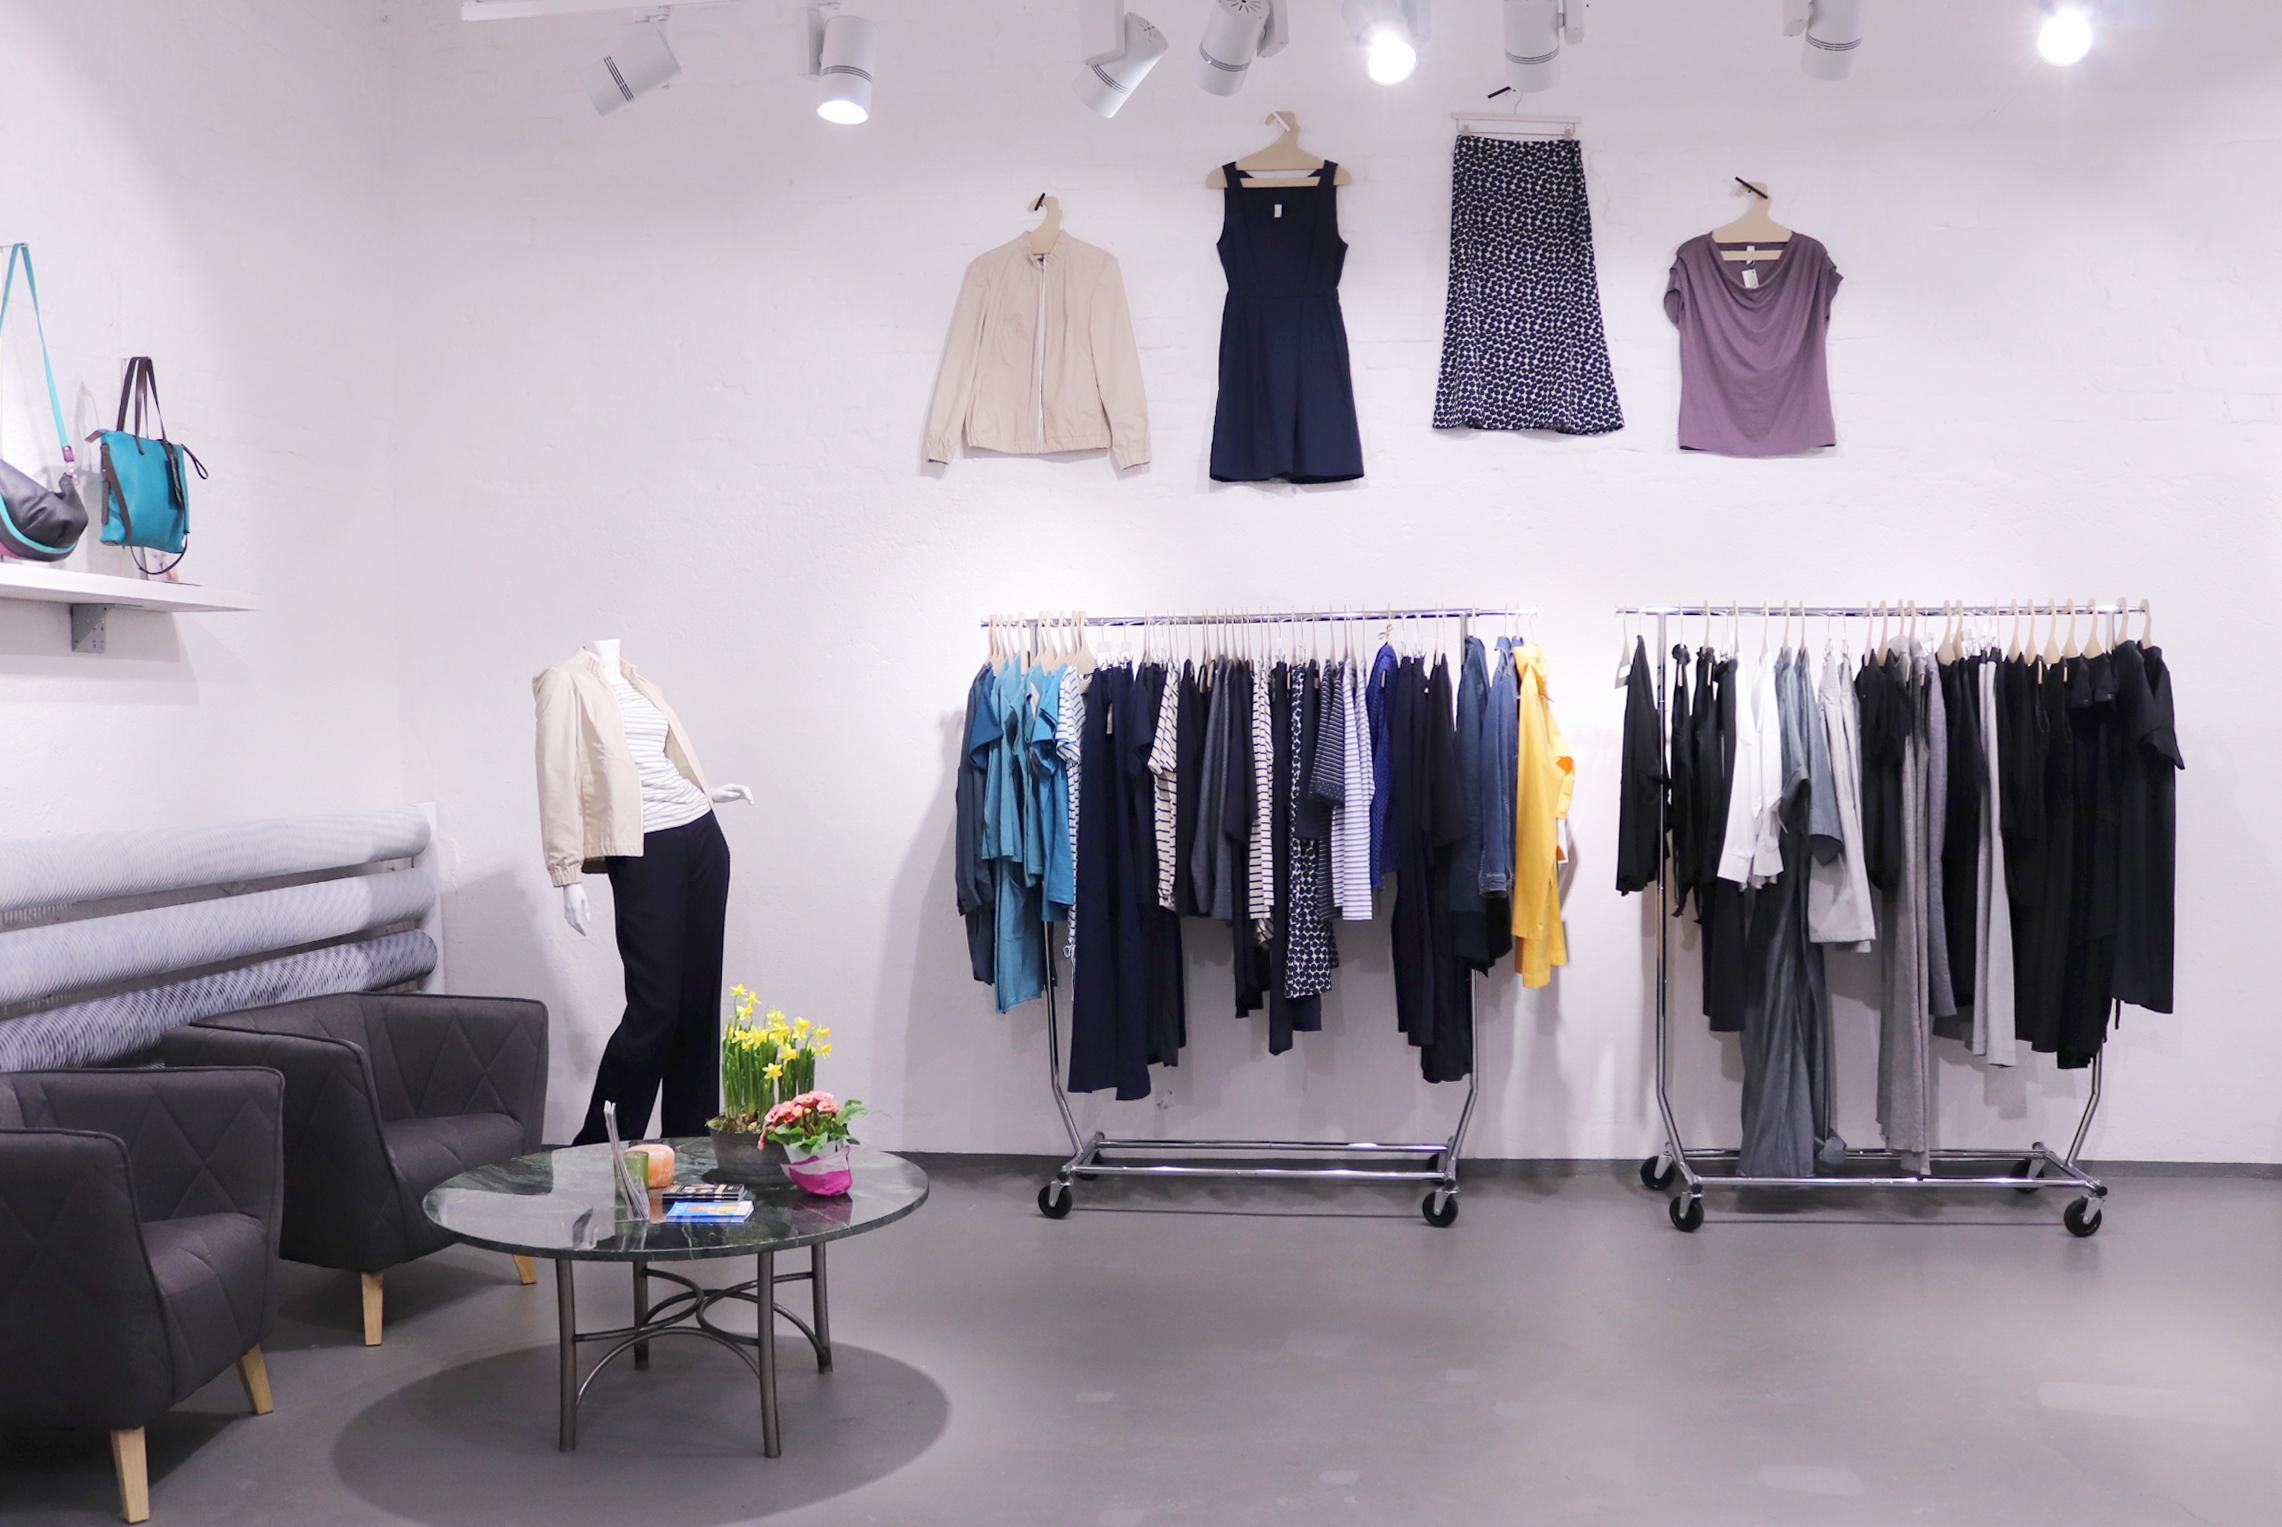 https://buygoodstuff.de/wp-content/uploads/2019/01/Bild-4-roberta_organic_fashion_Seite.jpg